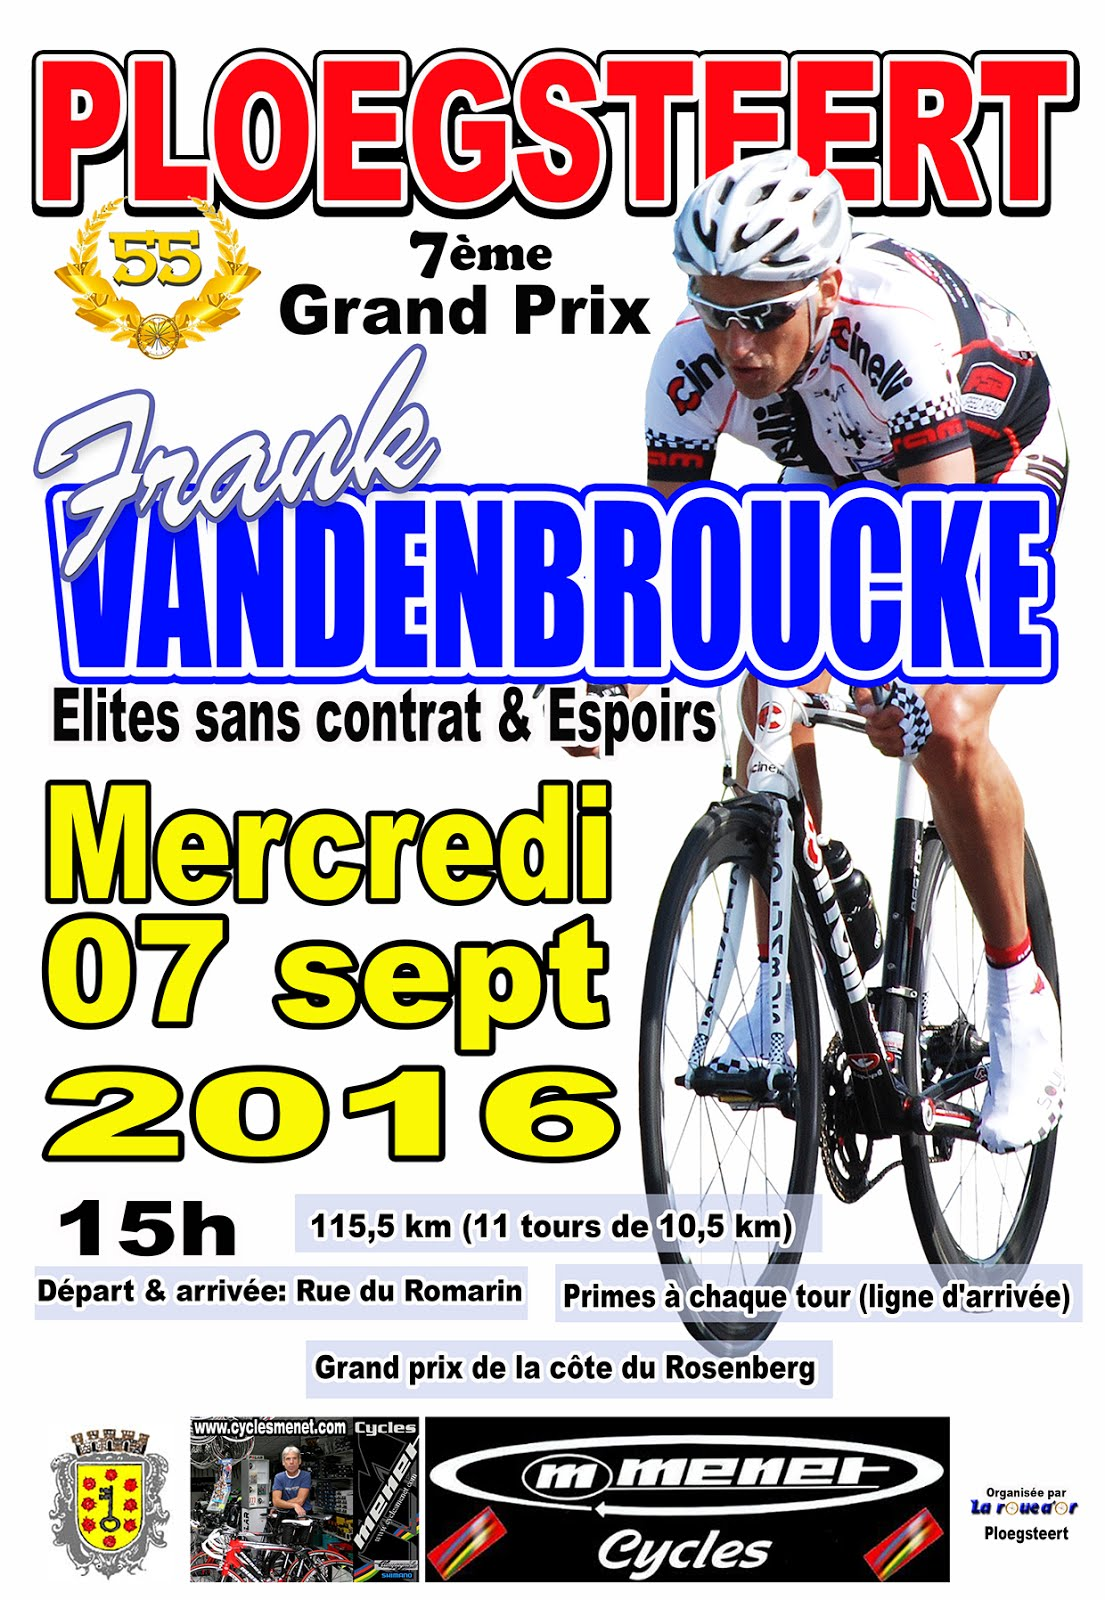 7 septembre Grand Prix Frank Vandenbroucke.